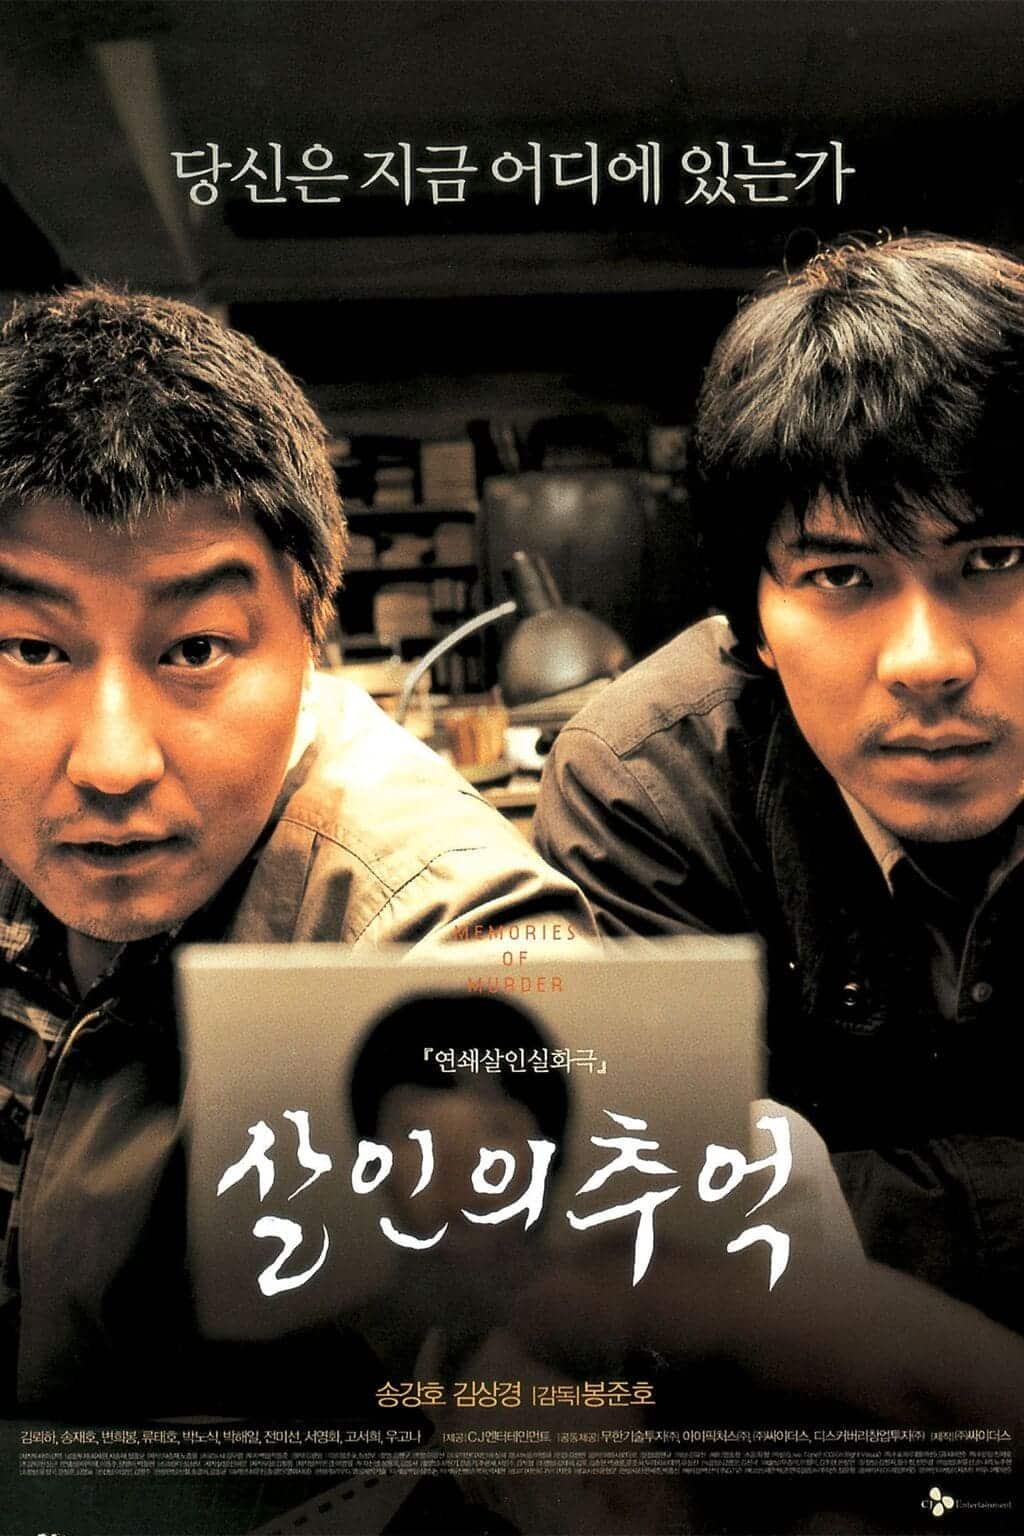 phim memories of murder